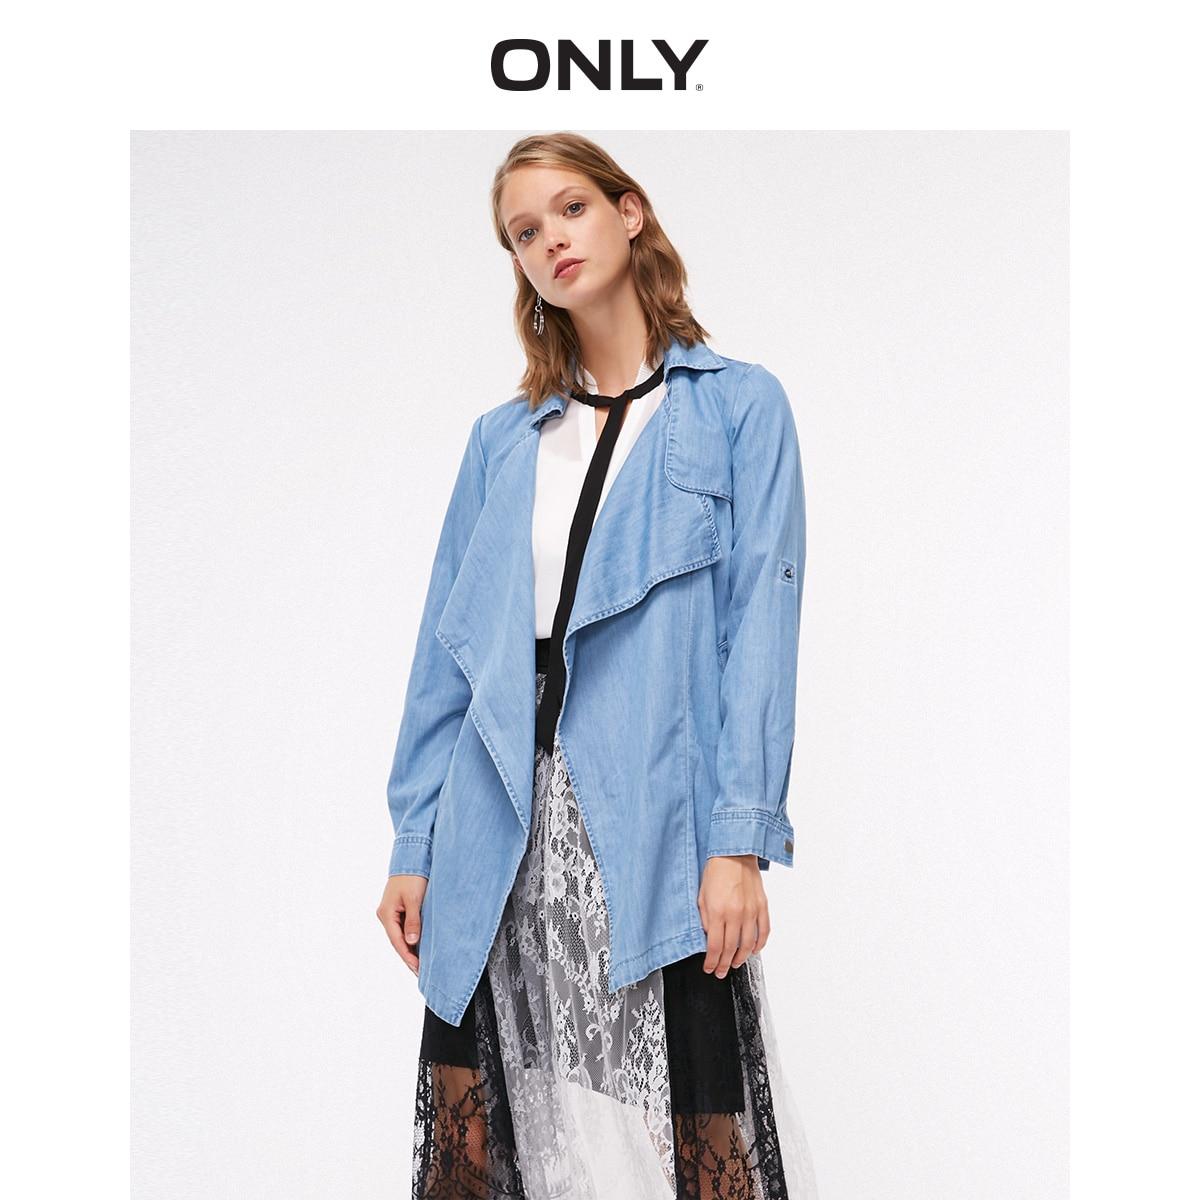 ONLY Summer New Vintage Pure Color Lapel Waist Tie Denim Windbreaker Jacket Trenchcoat Thin Women   |  118354520